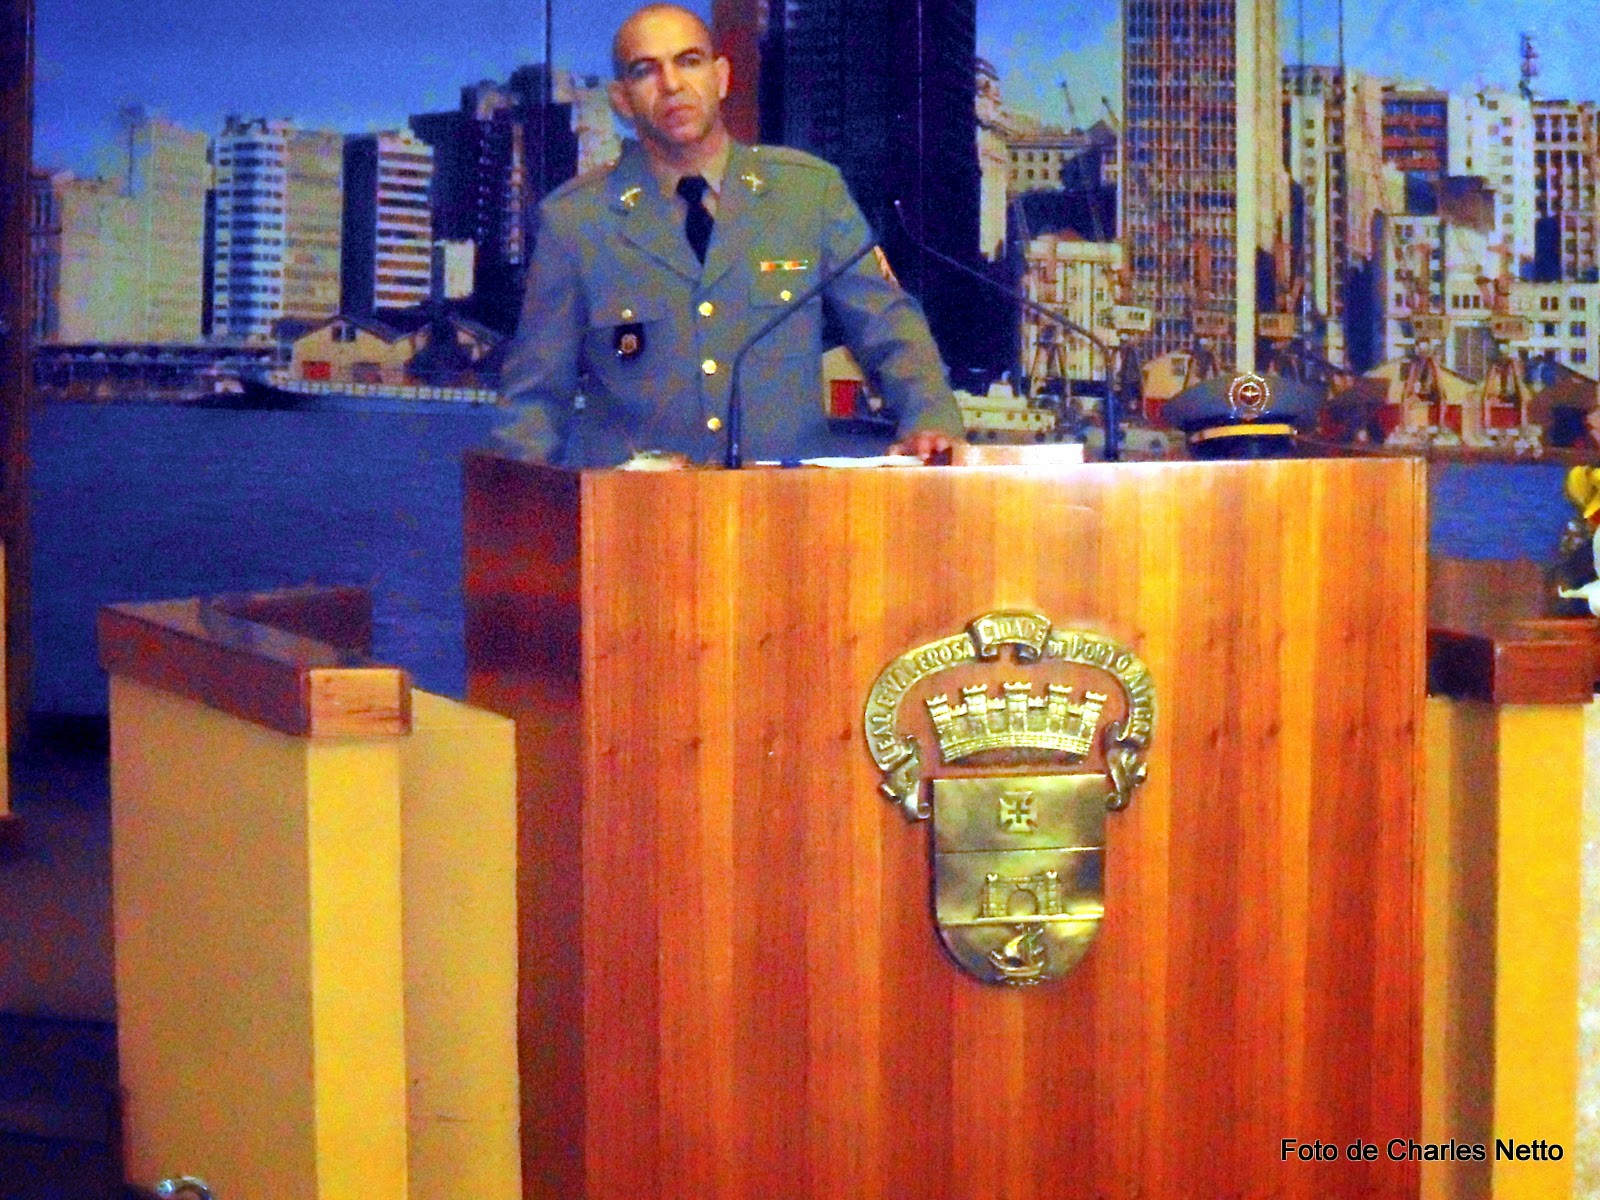 Foto de Autoria de Charles Netto que registrou o1º Sgt Marco Rodrigues na Câmara de Vereadores de PoA, RS/BR